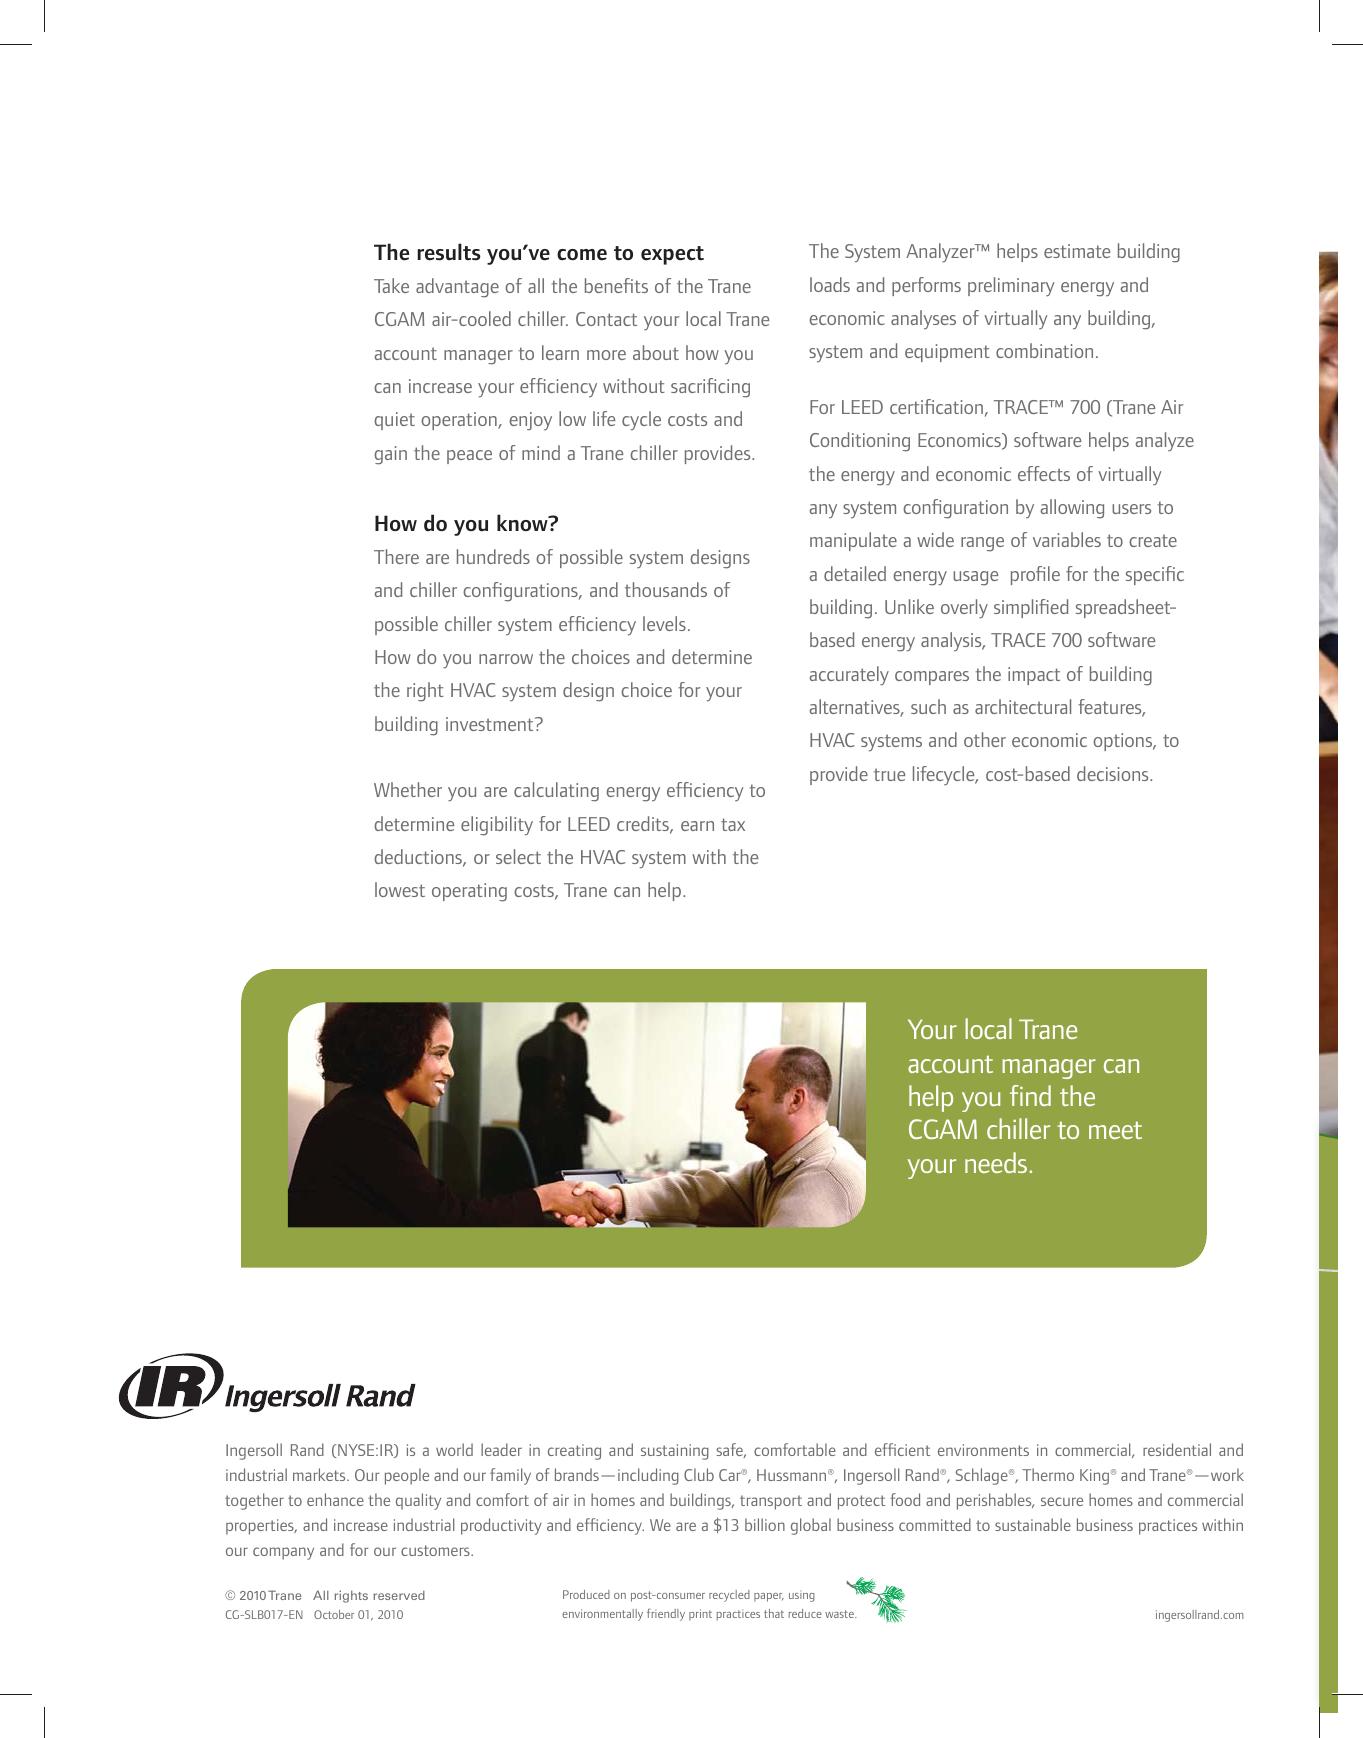 Trane scroll cgam brochure cg slb017 em 1010 sales air cooled page 8 of trane trane scroll cgam brochure cg slb017 xflitez Gallery